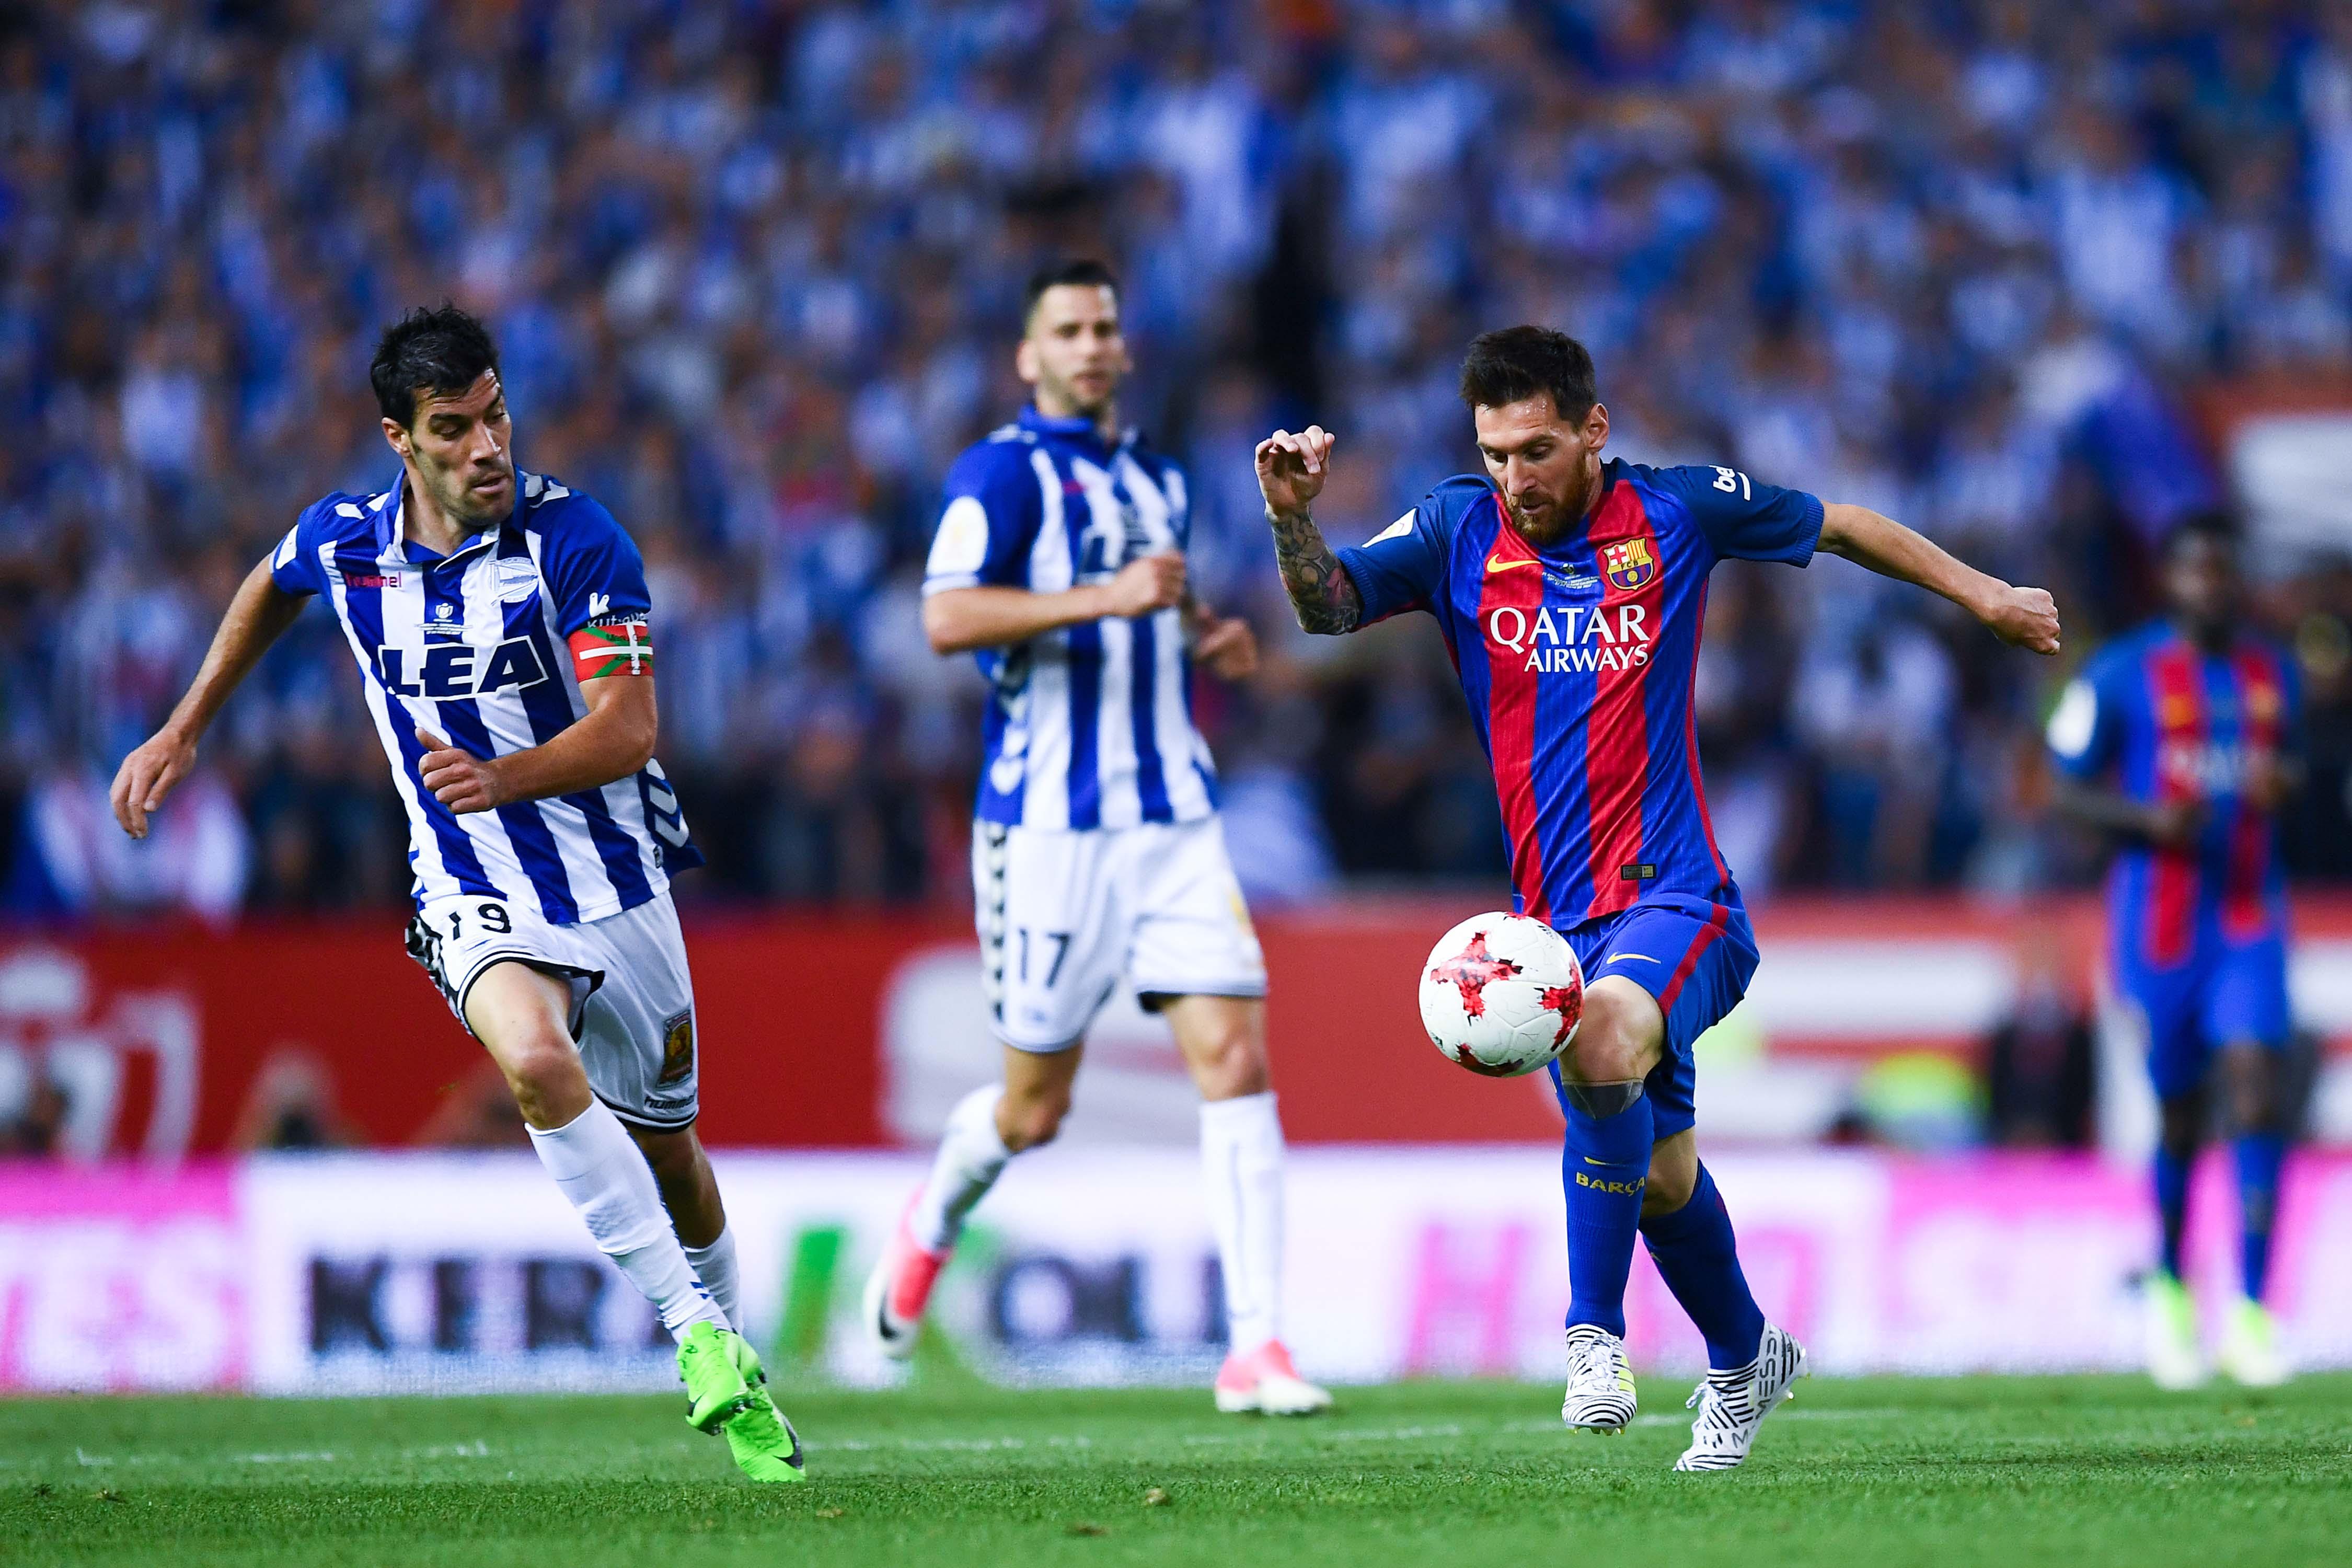 Прогнозы и советы на ставки по футболу